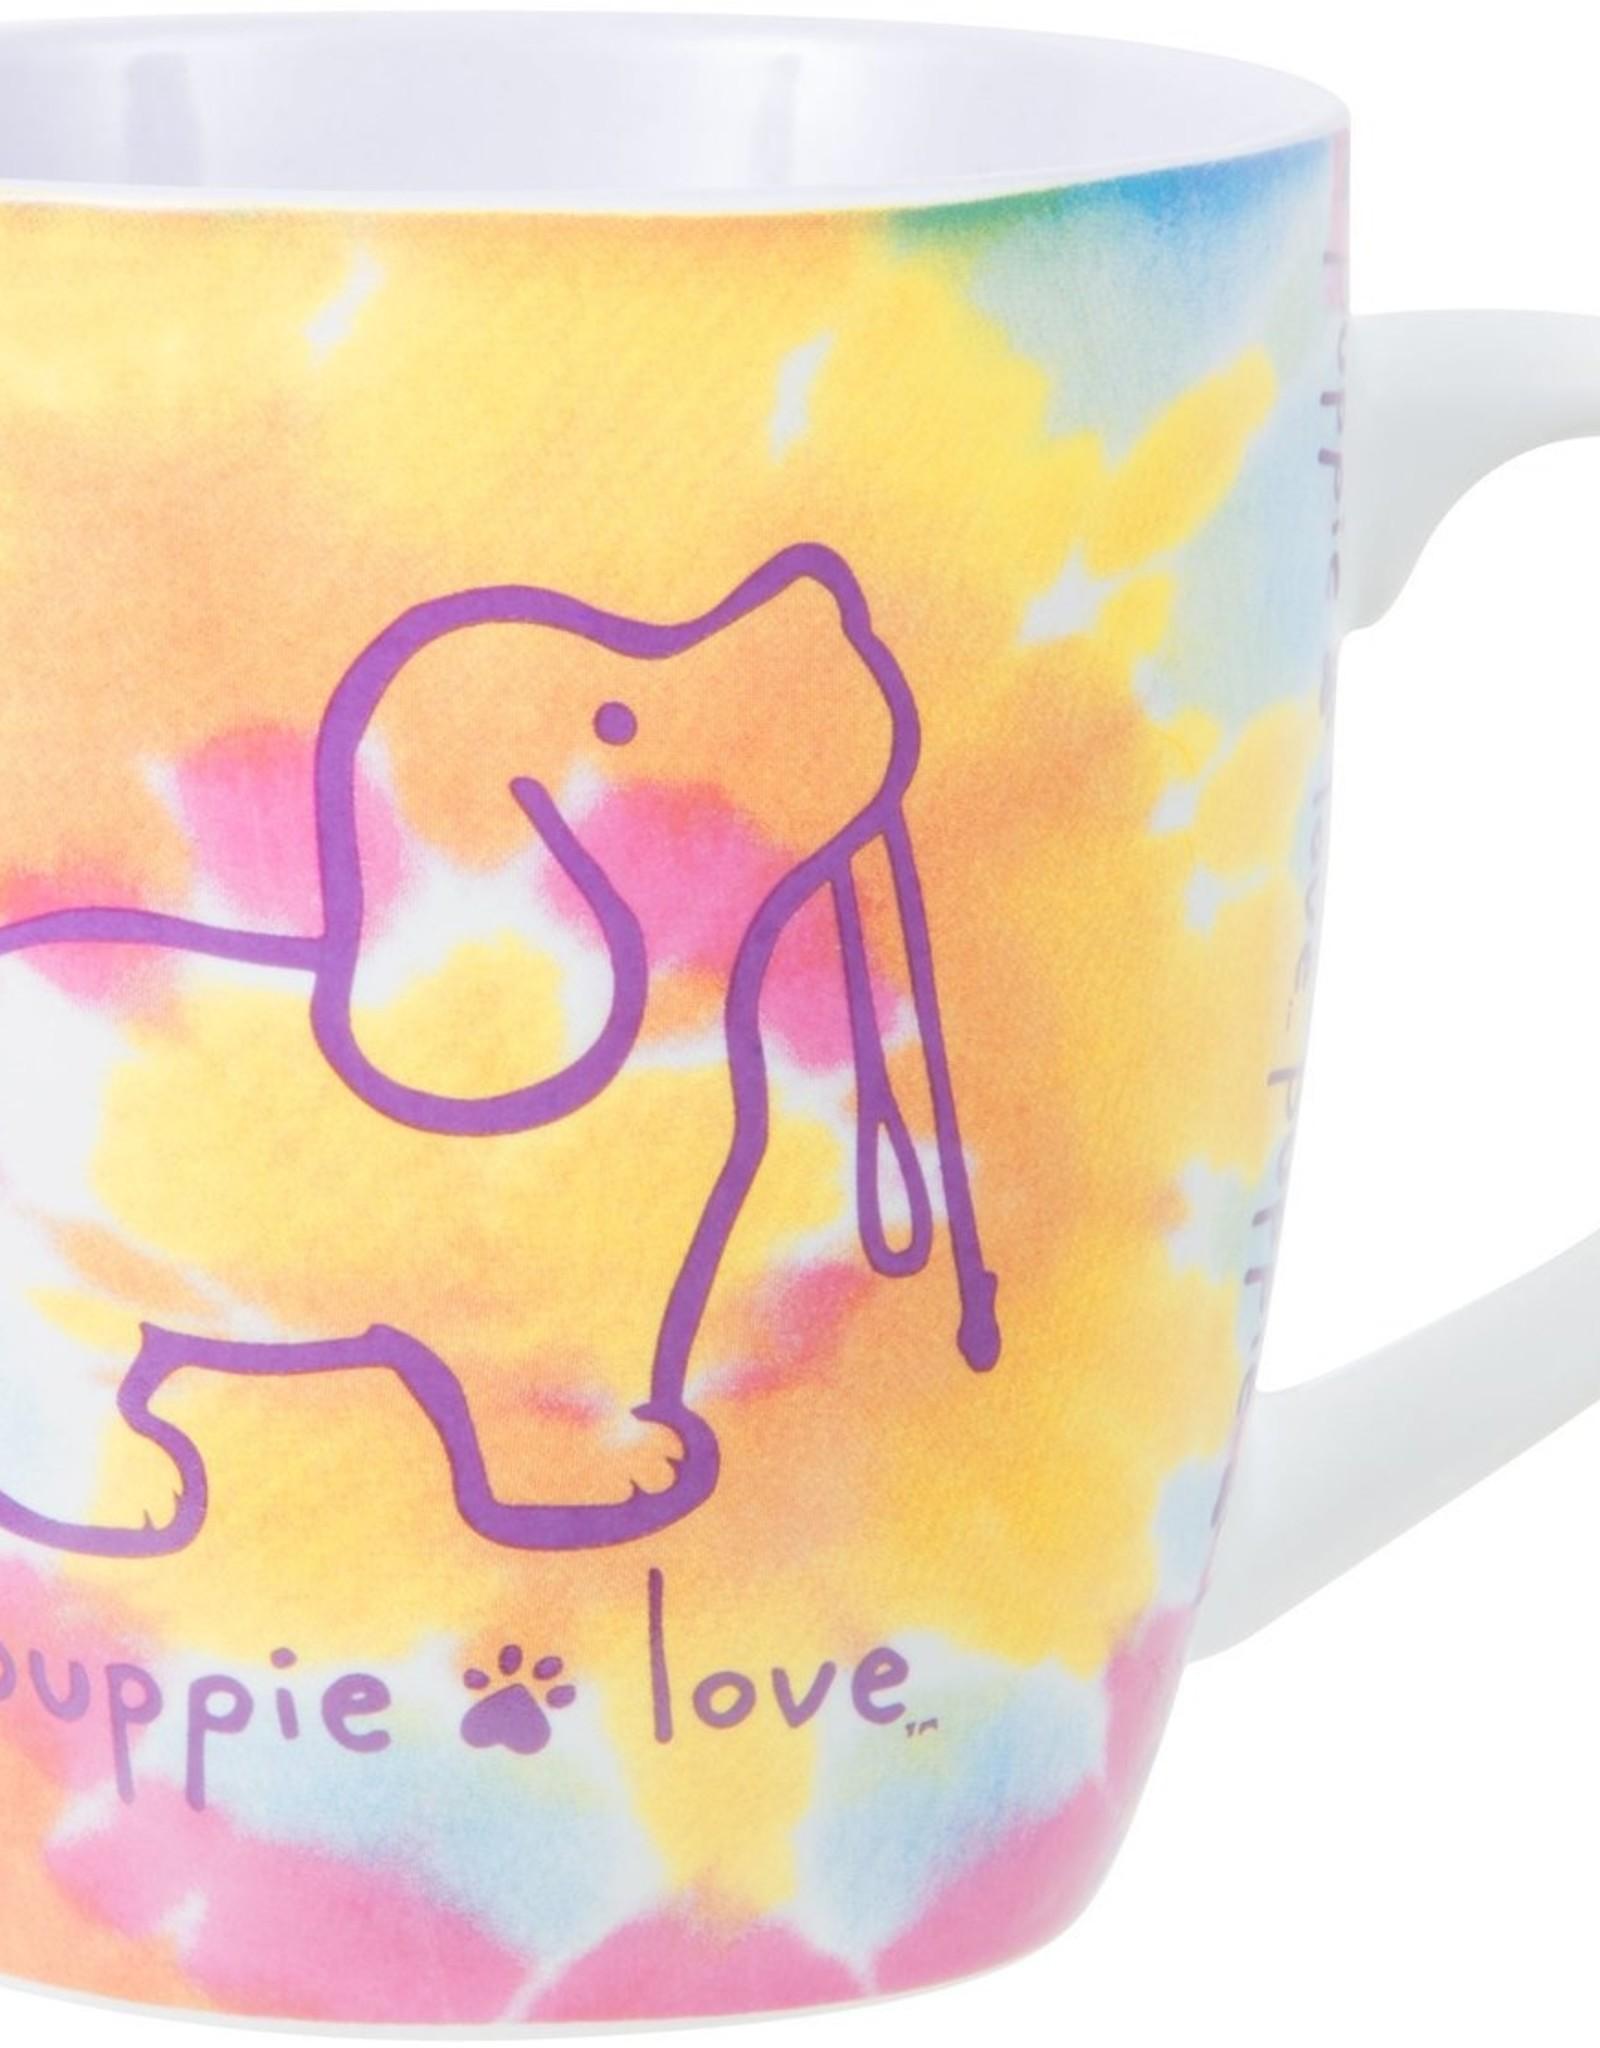 PAVILION Tie Dye Puppie Love Mug